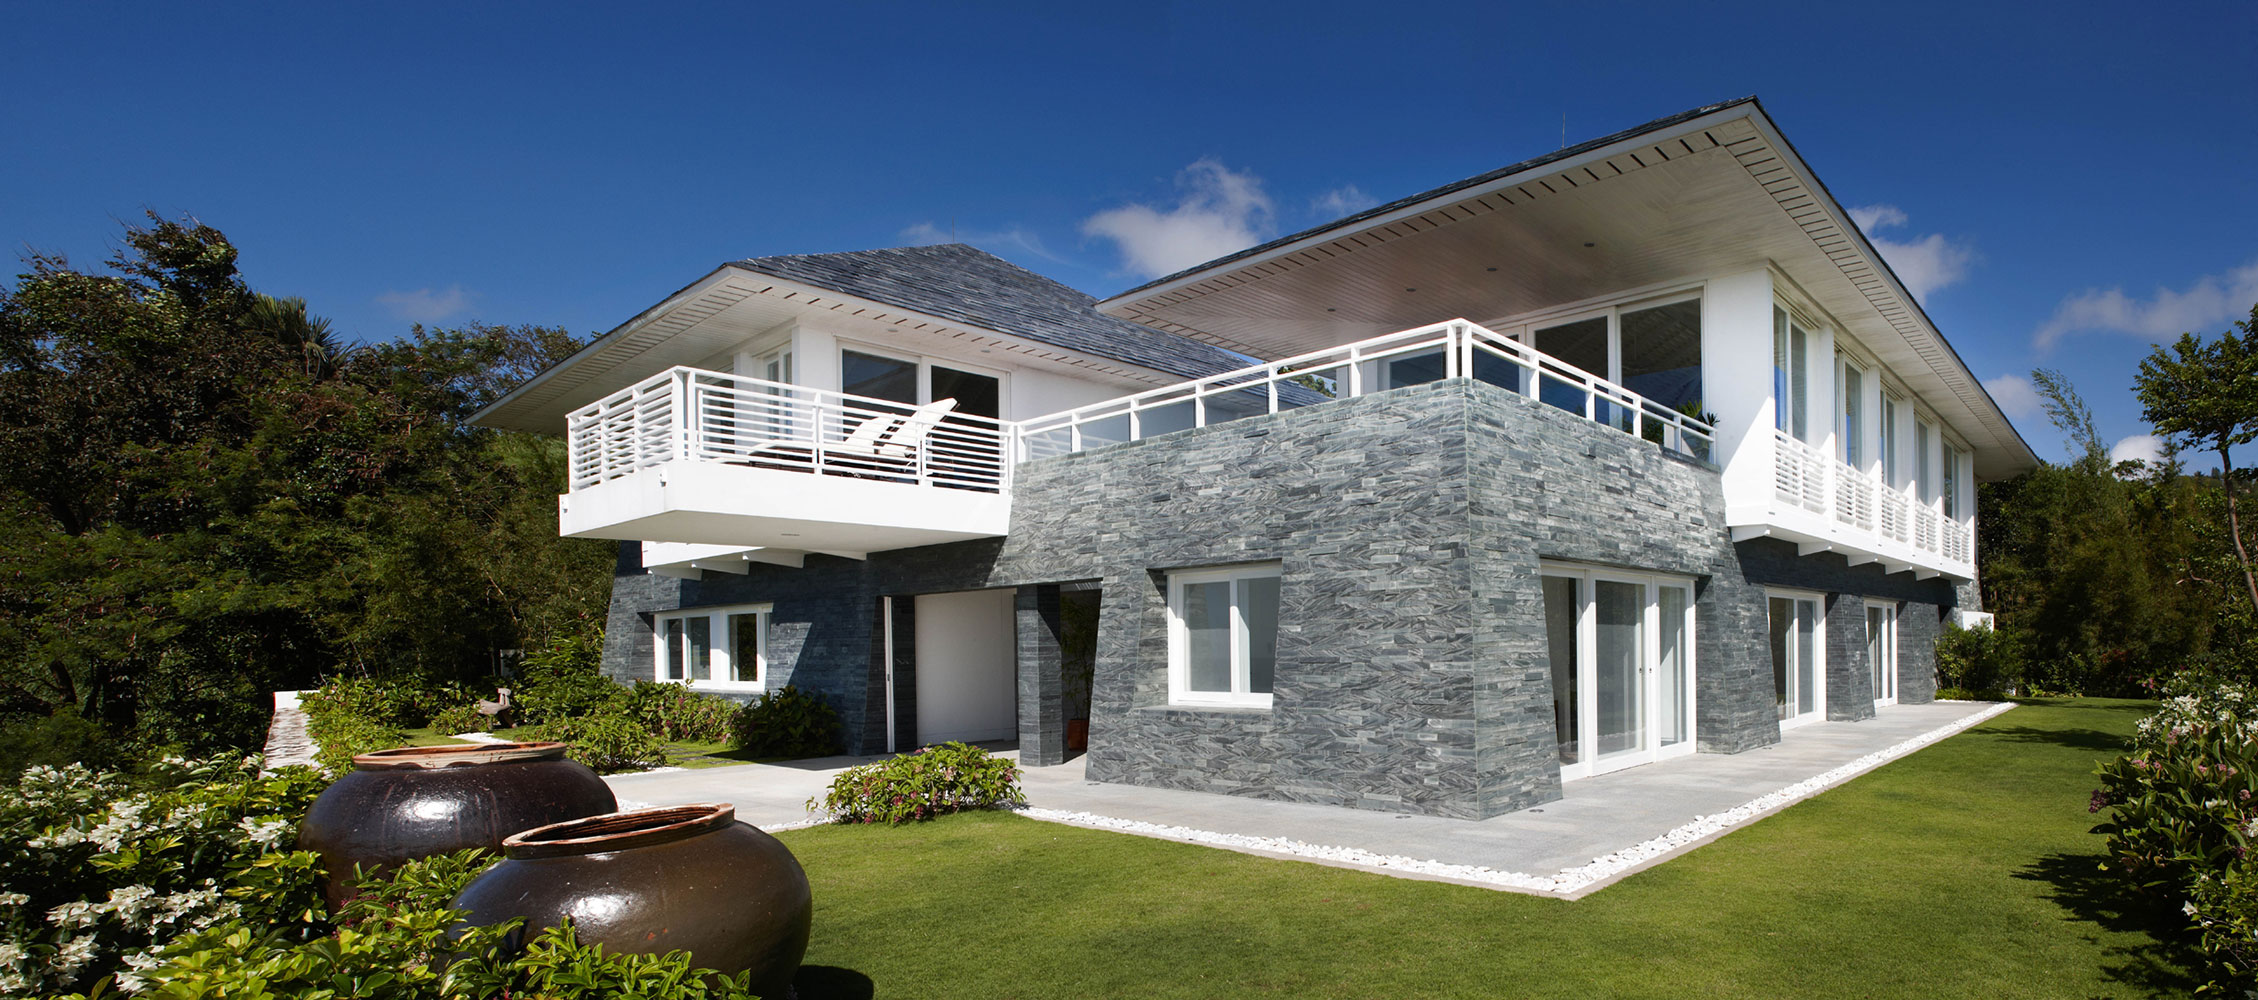 CS Architecture – Balai Taal Residence